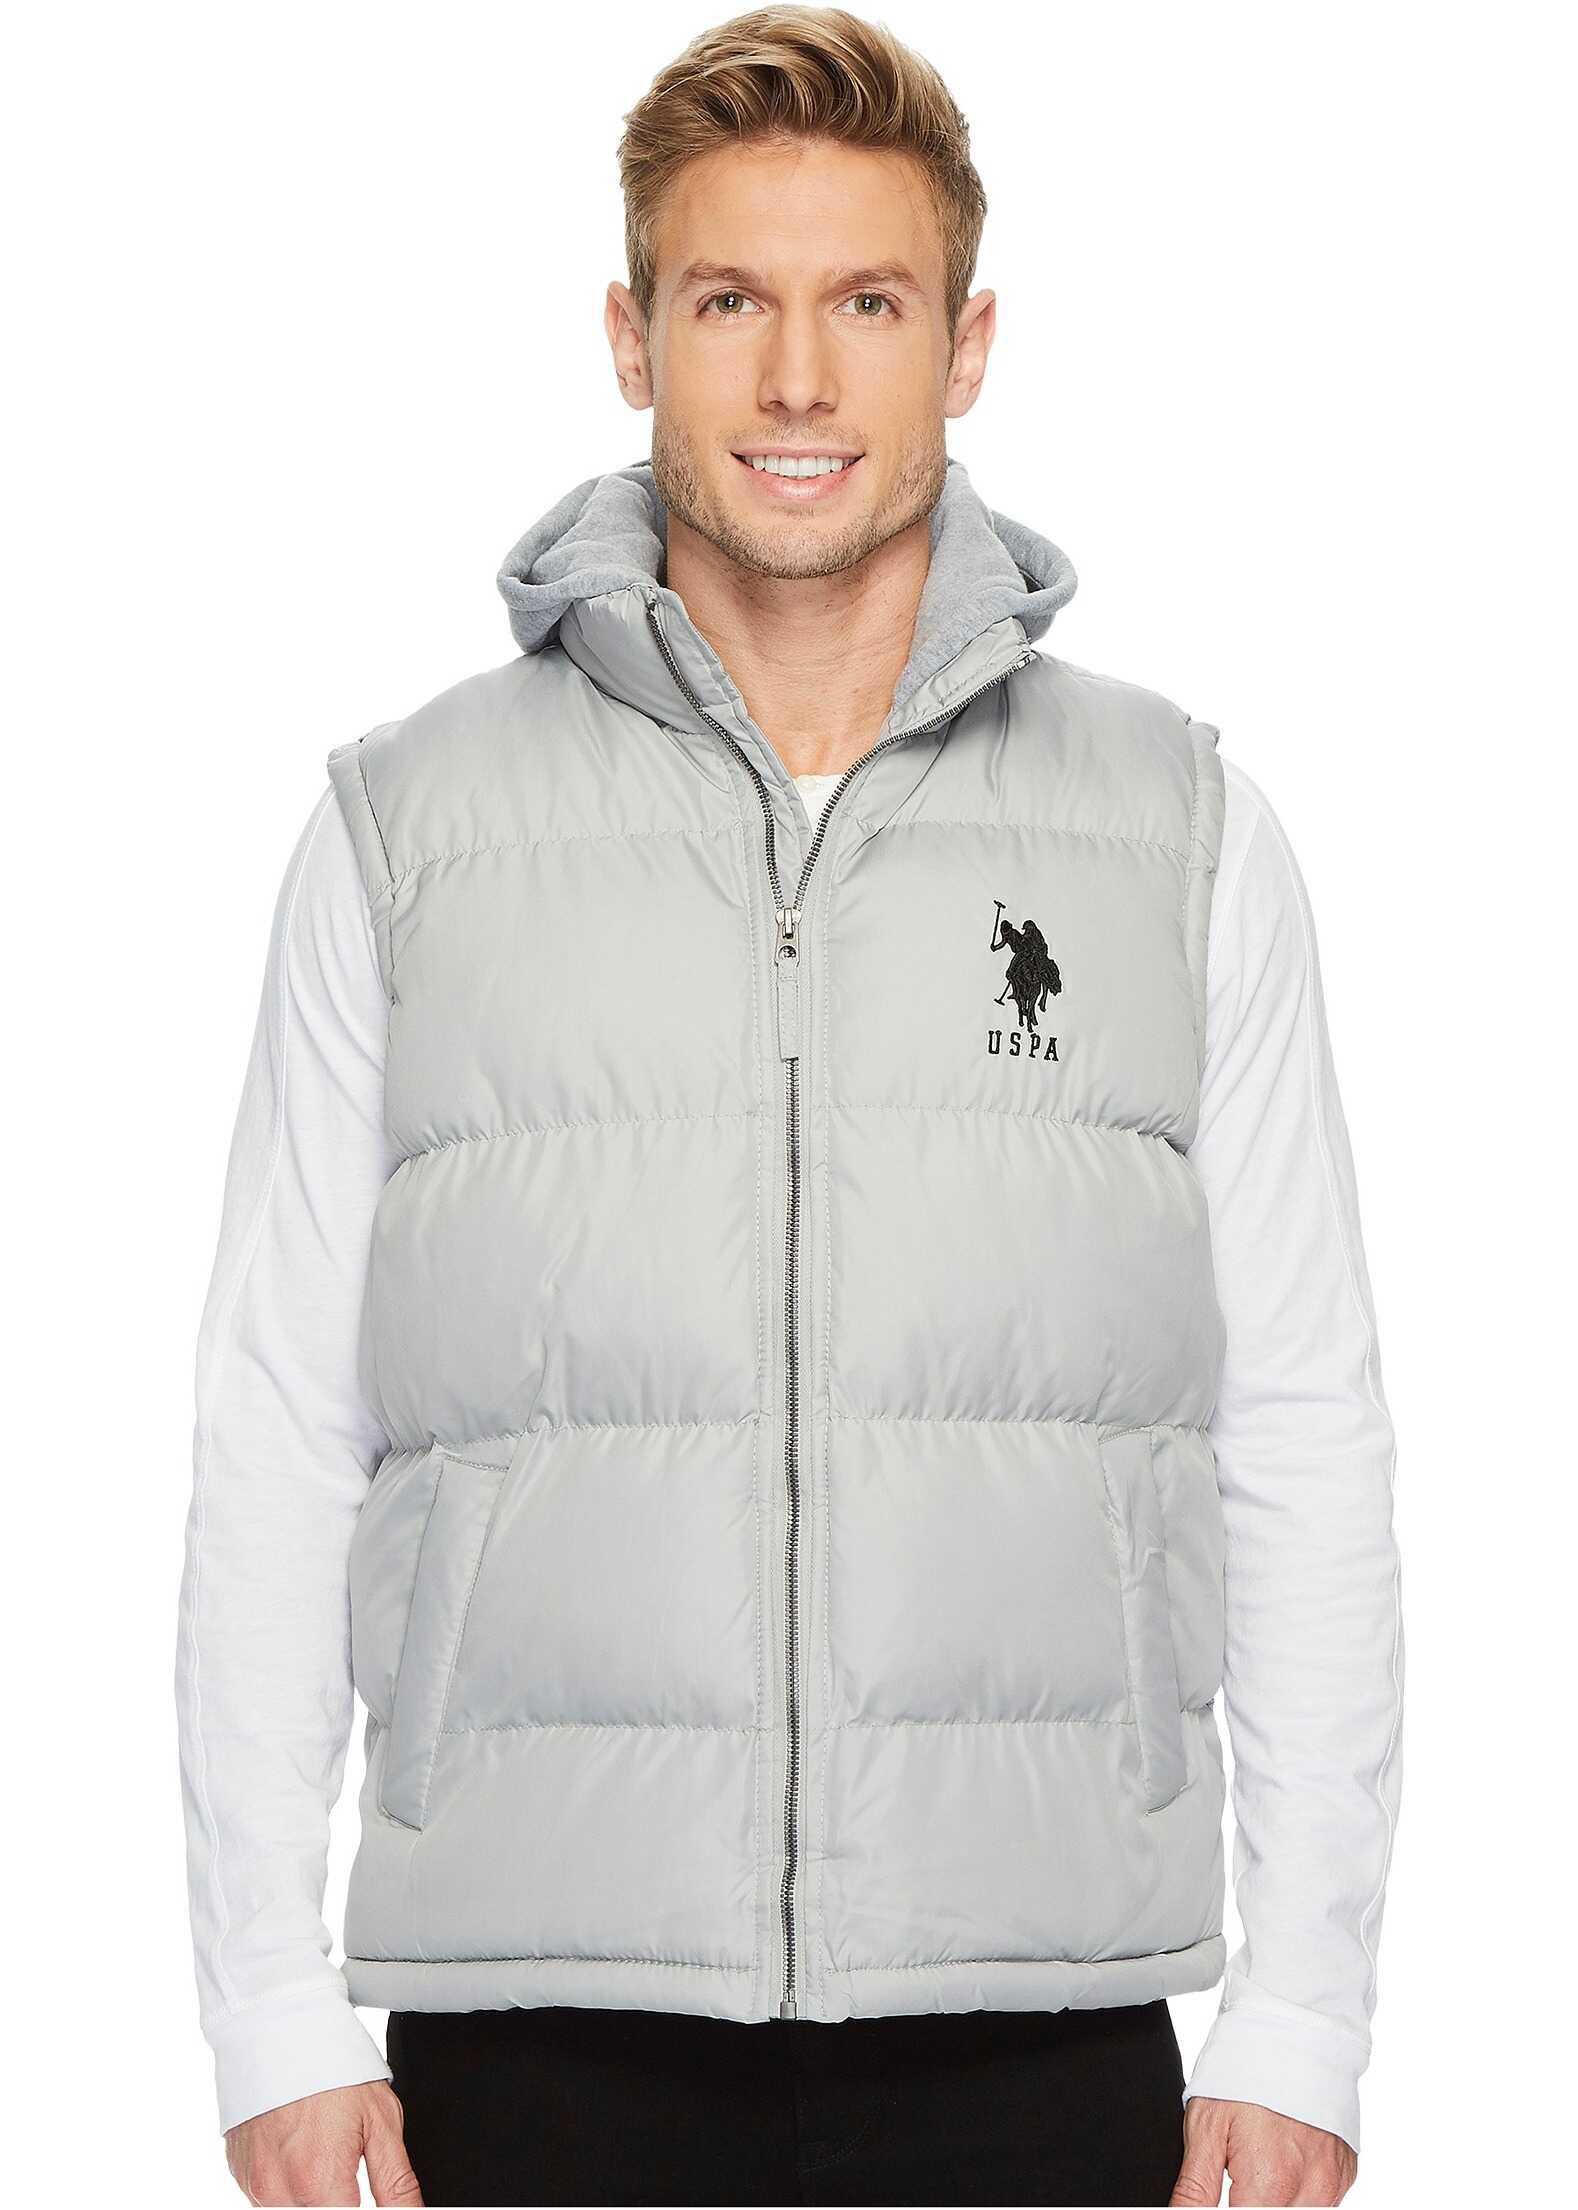 U.S. POLO ASSN. Basic Puffer Vest with Fleece Hood Lime Stone